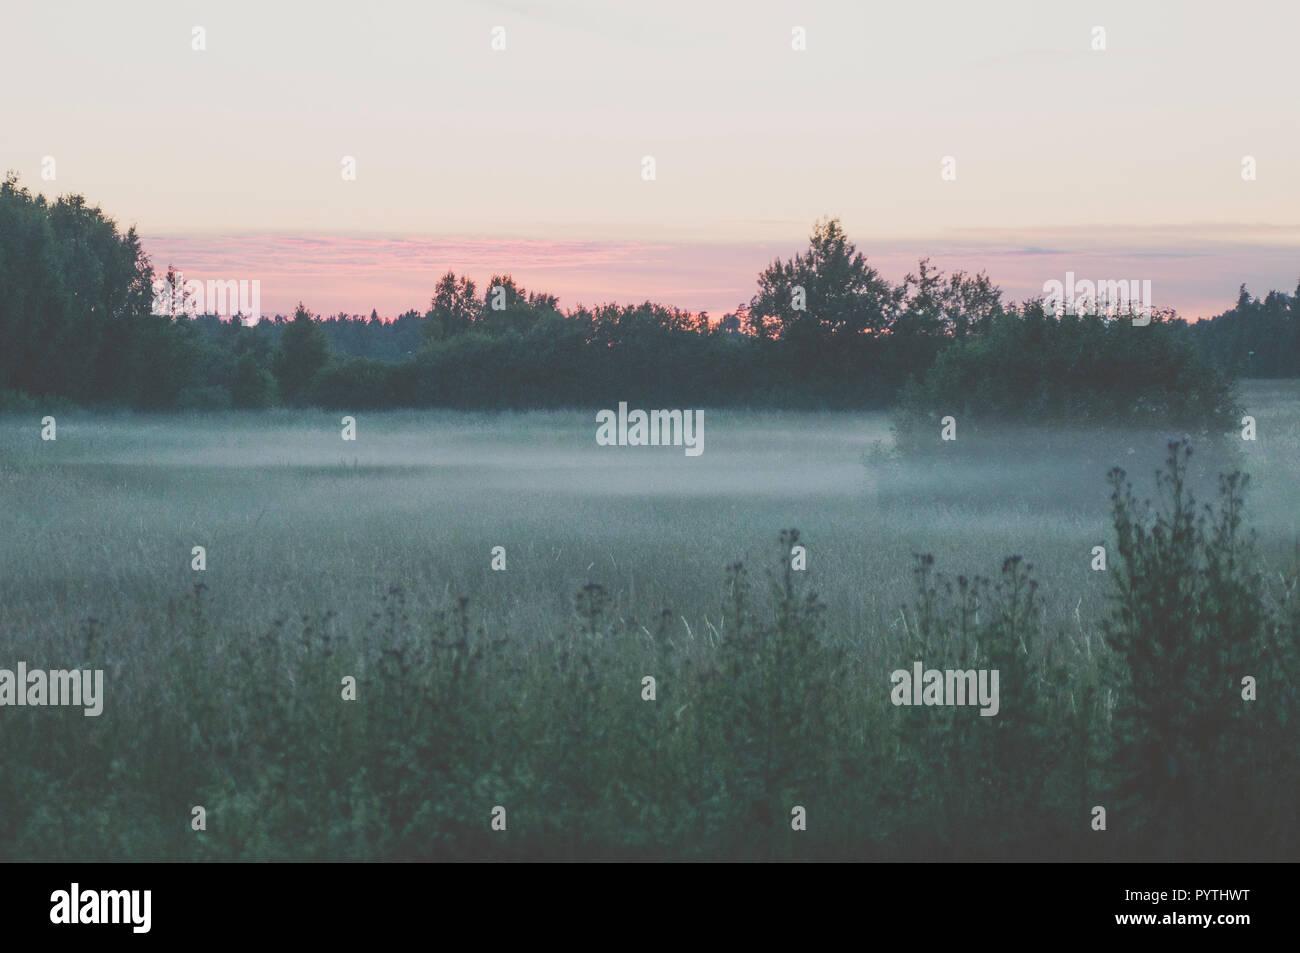 White fog lays over the grass field. Romantic summer evening scene. - Stock Image